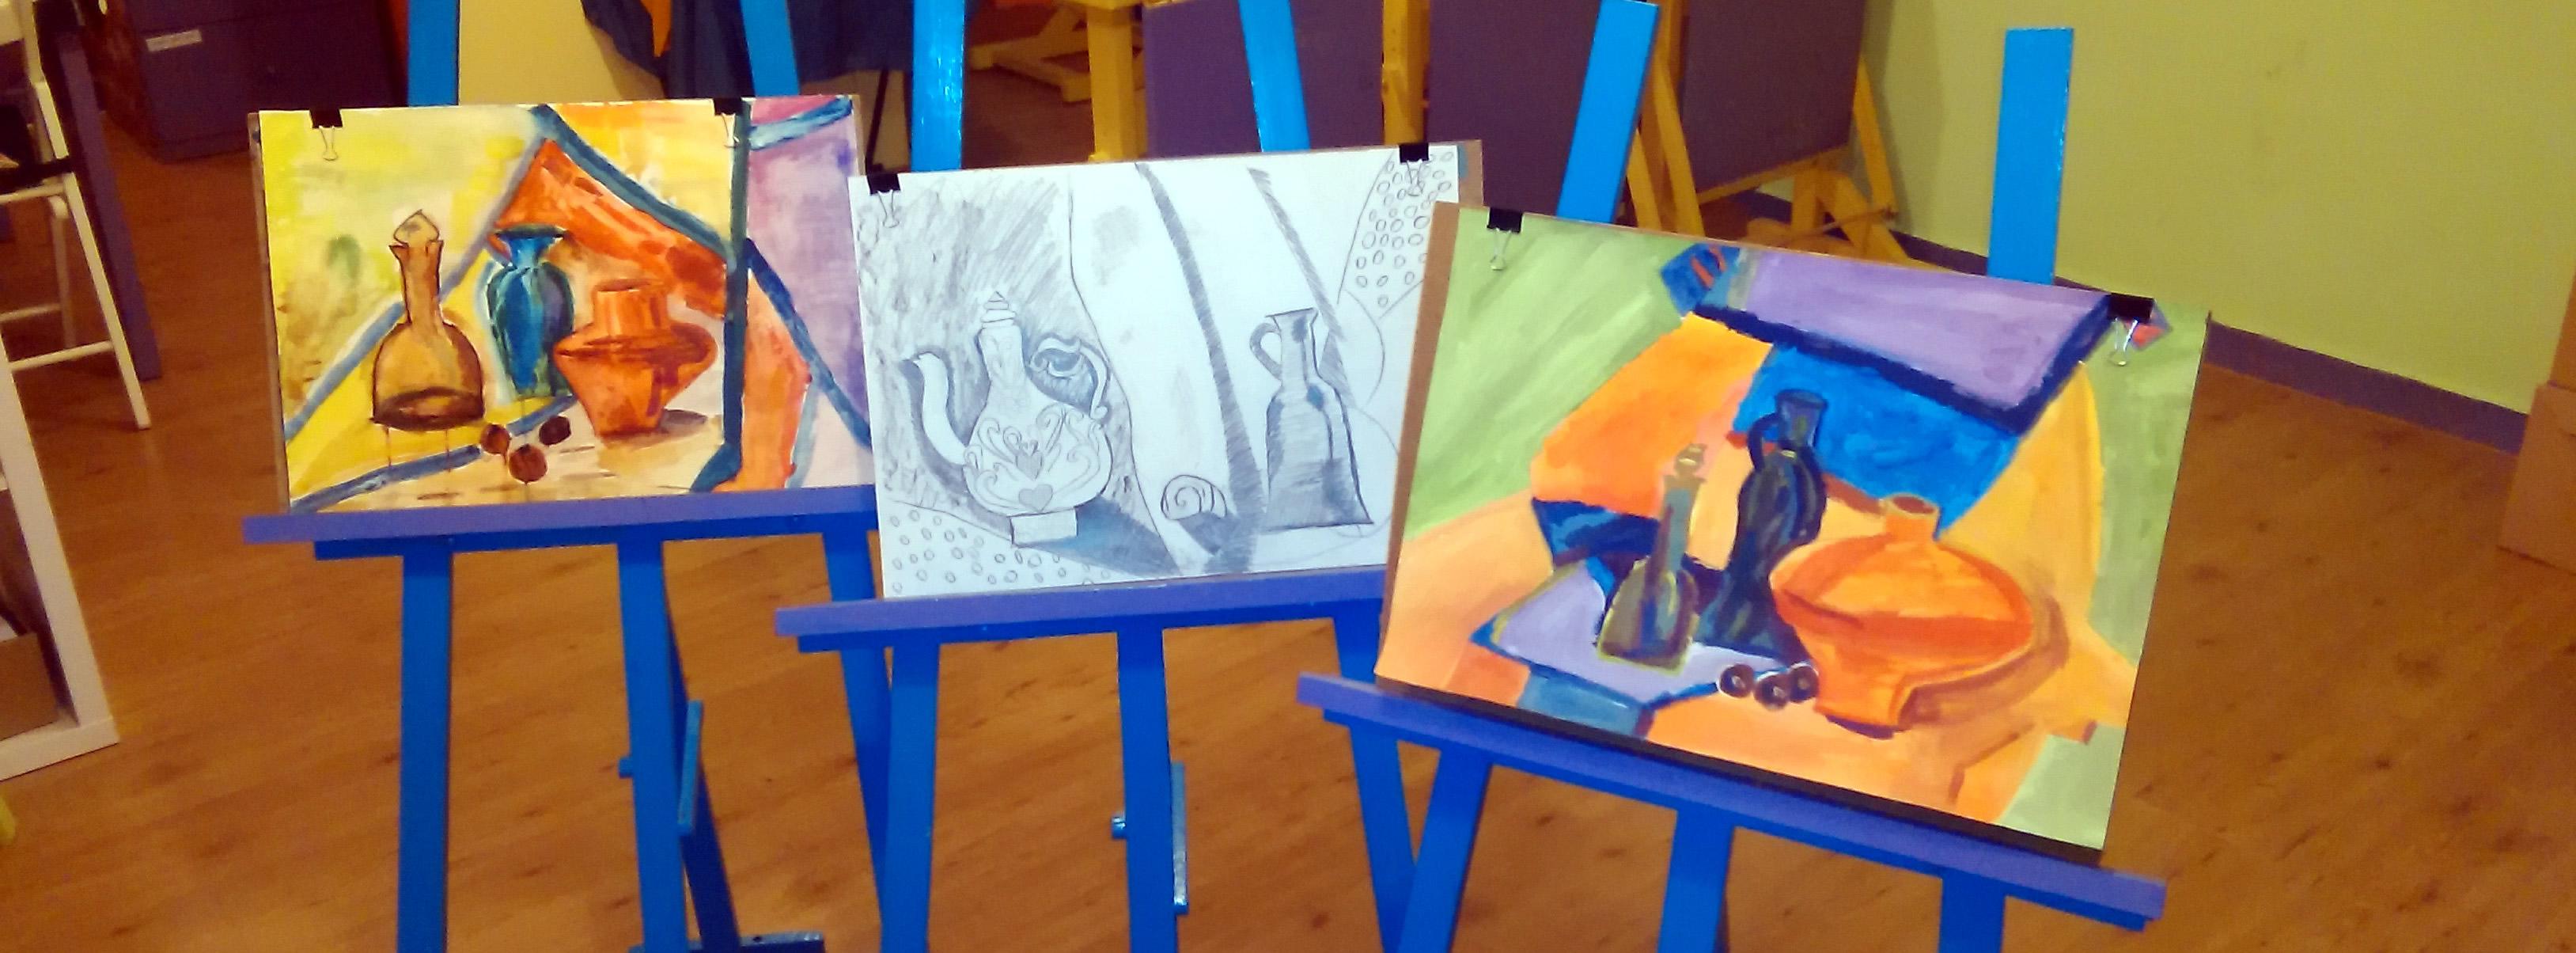 Графични и живописни творби на деца от студиото